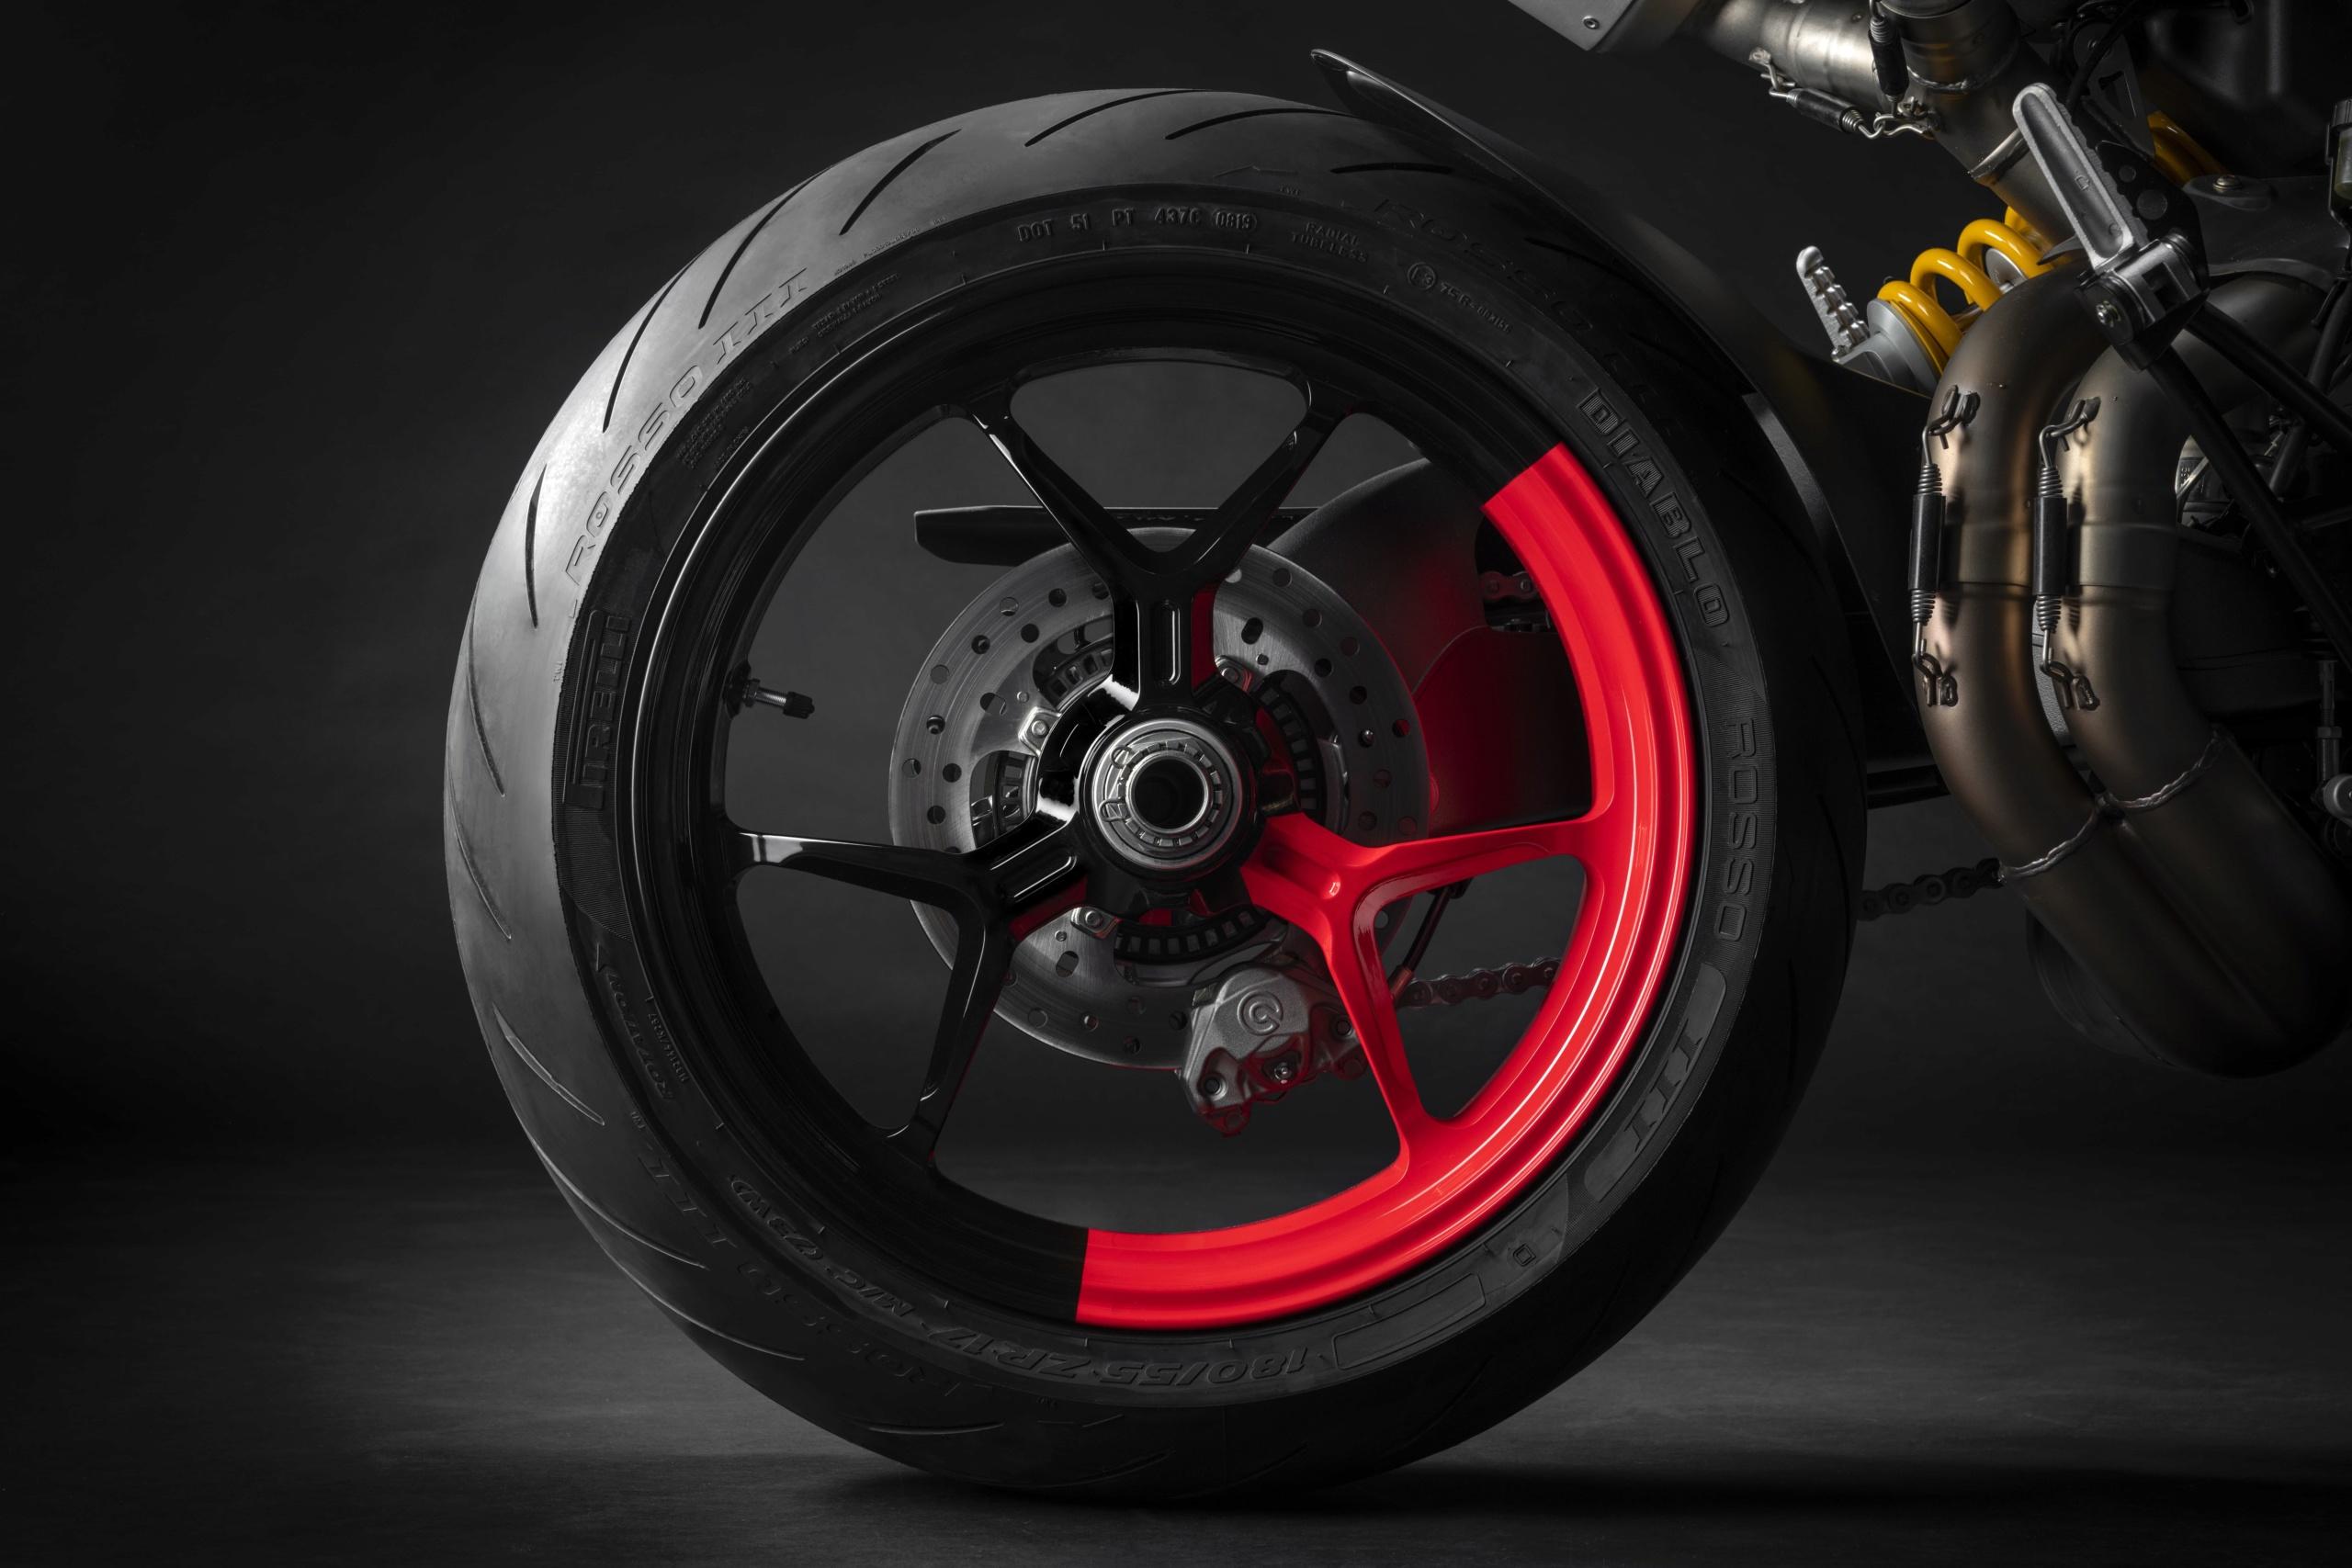 Ducati Hypermotard 950 RVE  12_duc10